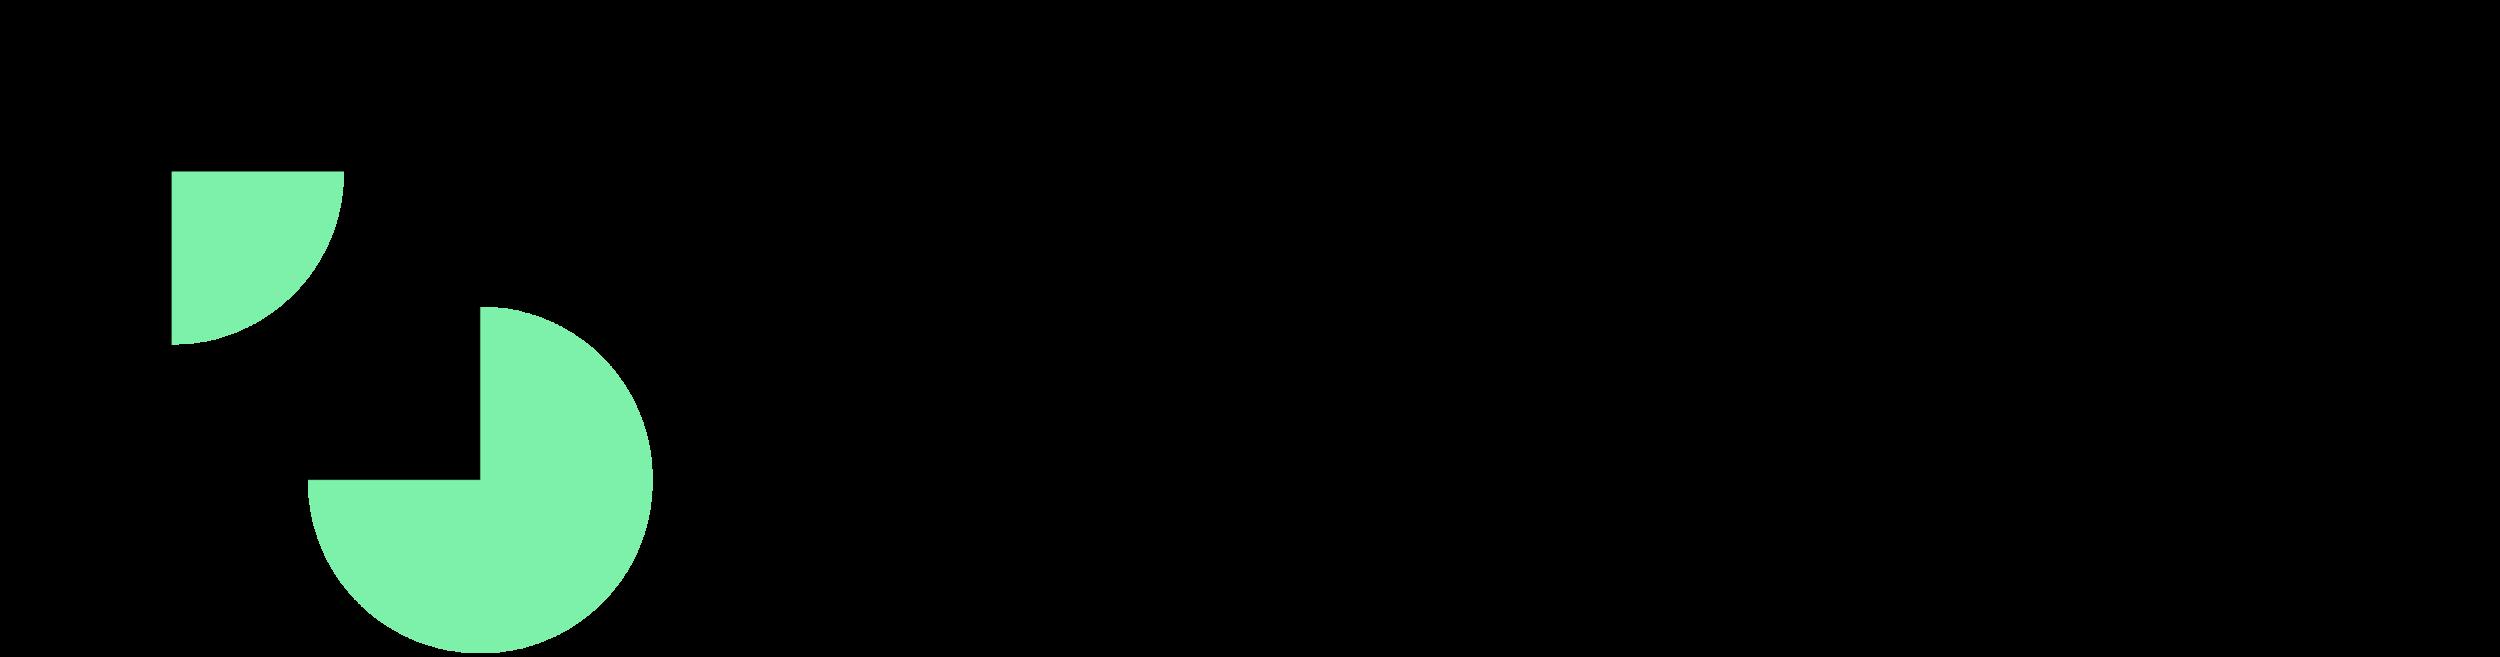 figur8_LOGO-C-H.png